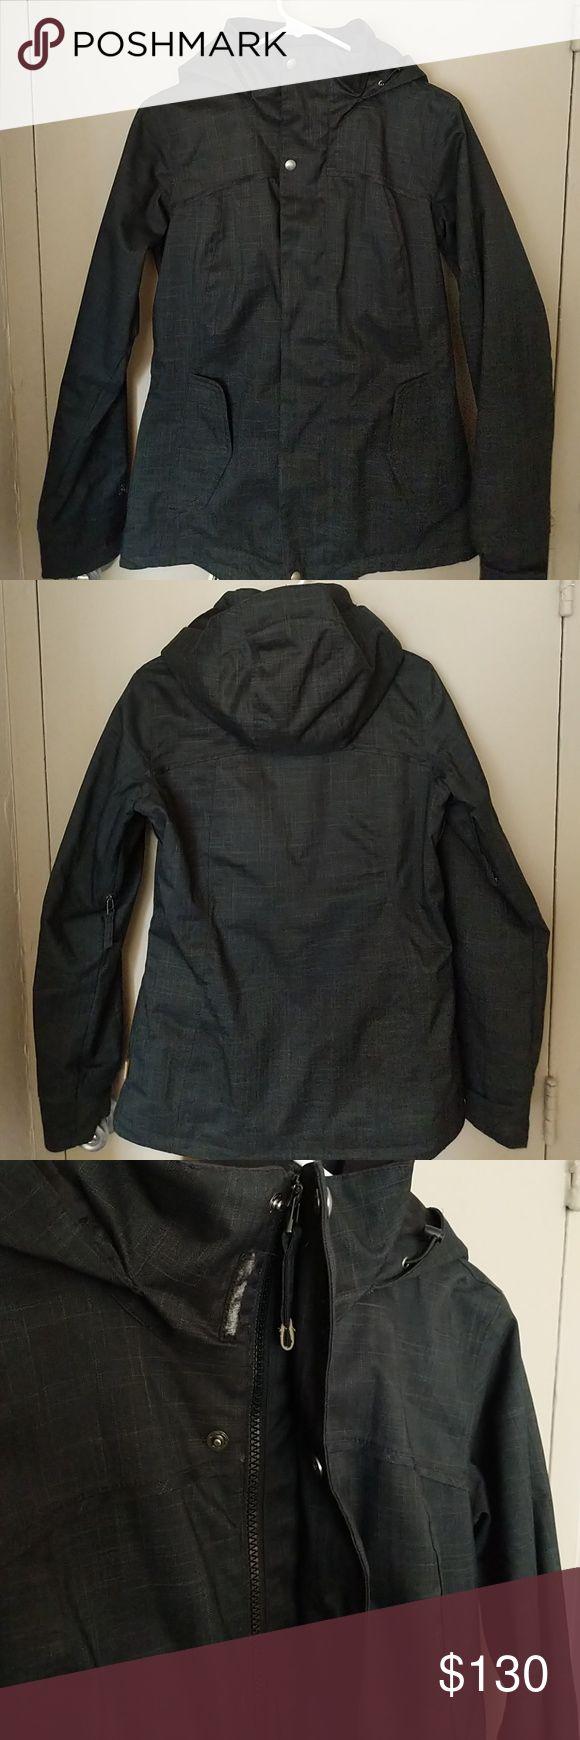 Burton Ski/Board Jacket Women's Medium Slate Blue ski or snowboarding jacket. Worn one season. Big front pockets and pit zips Burton Jackets & Coats